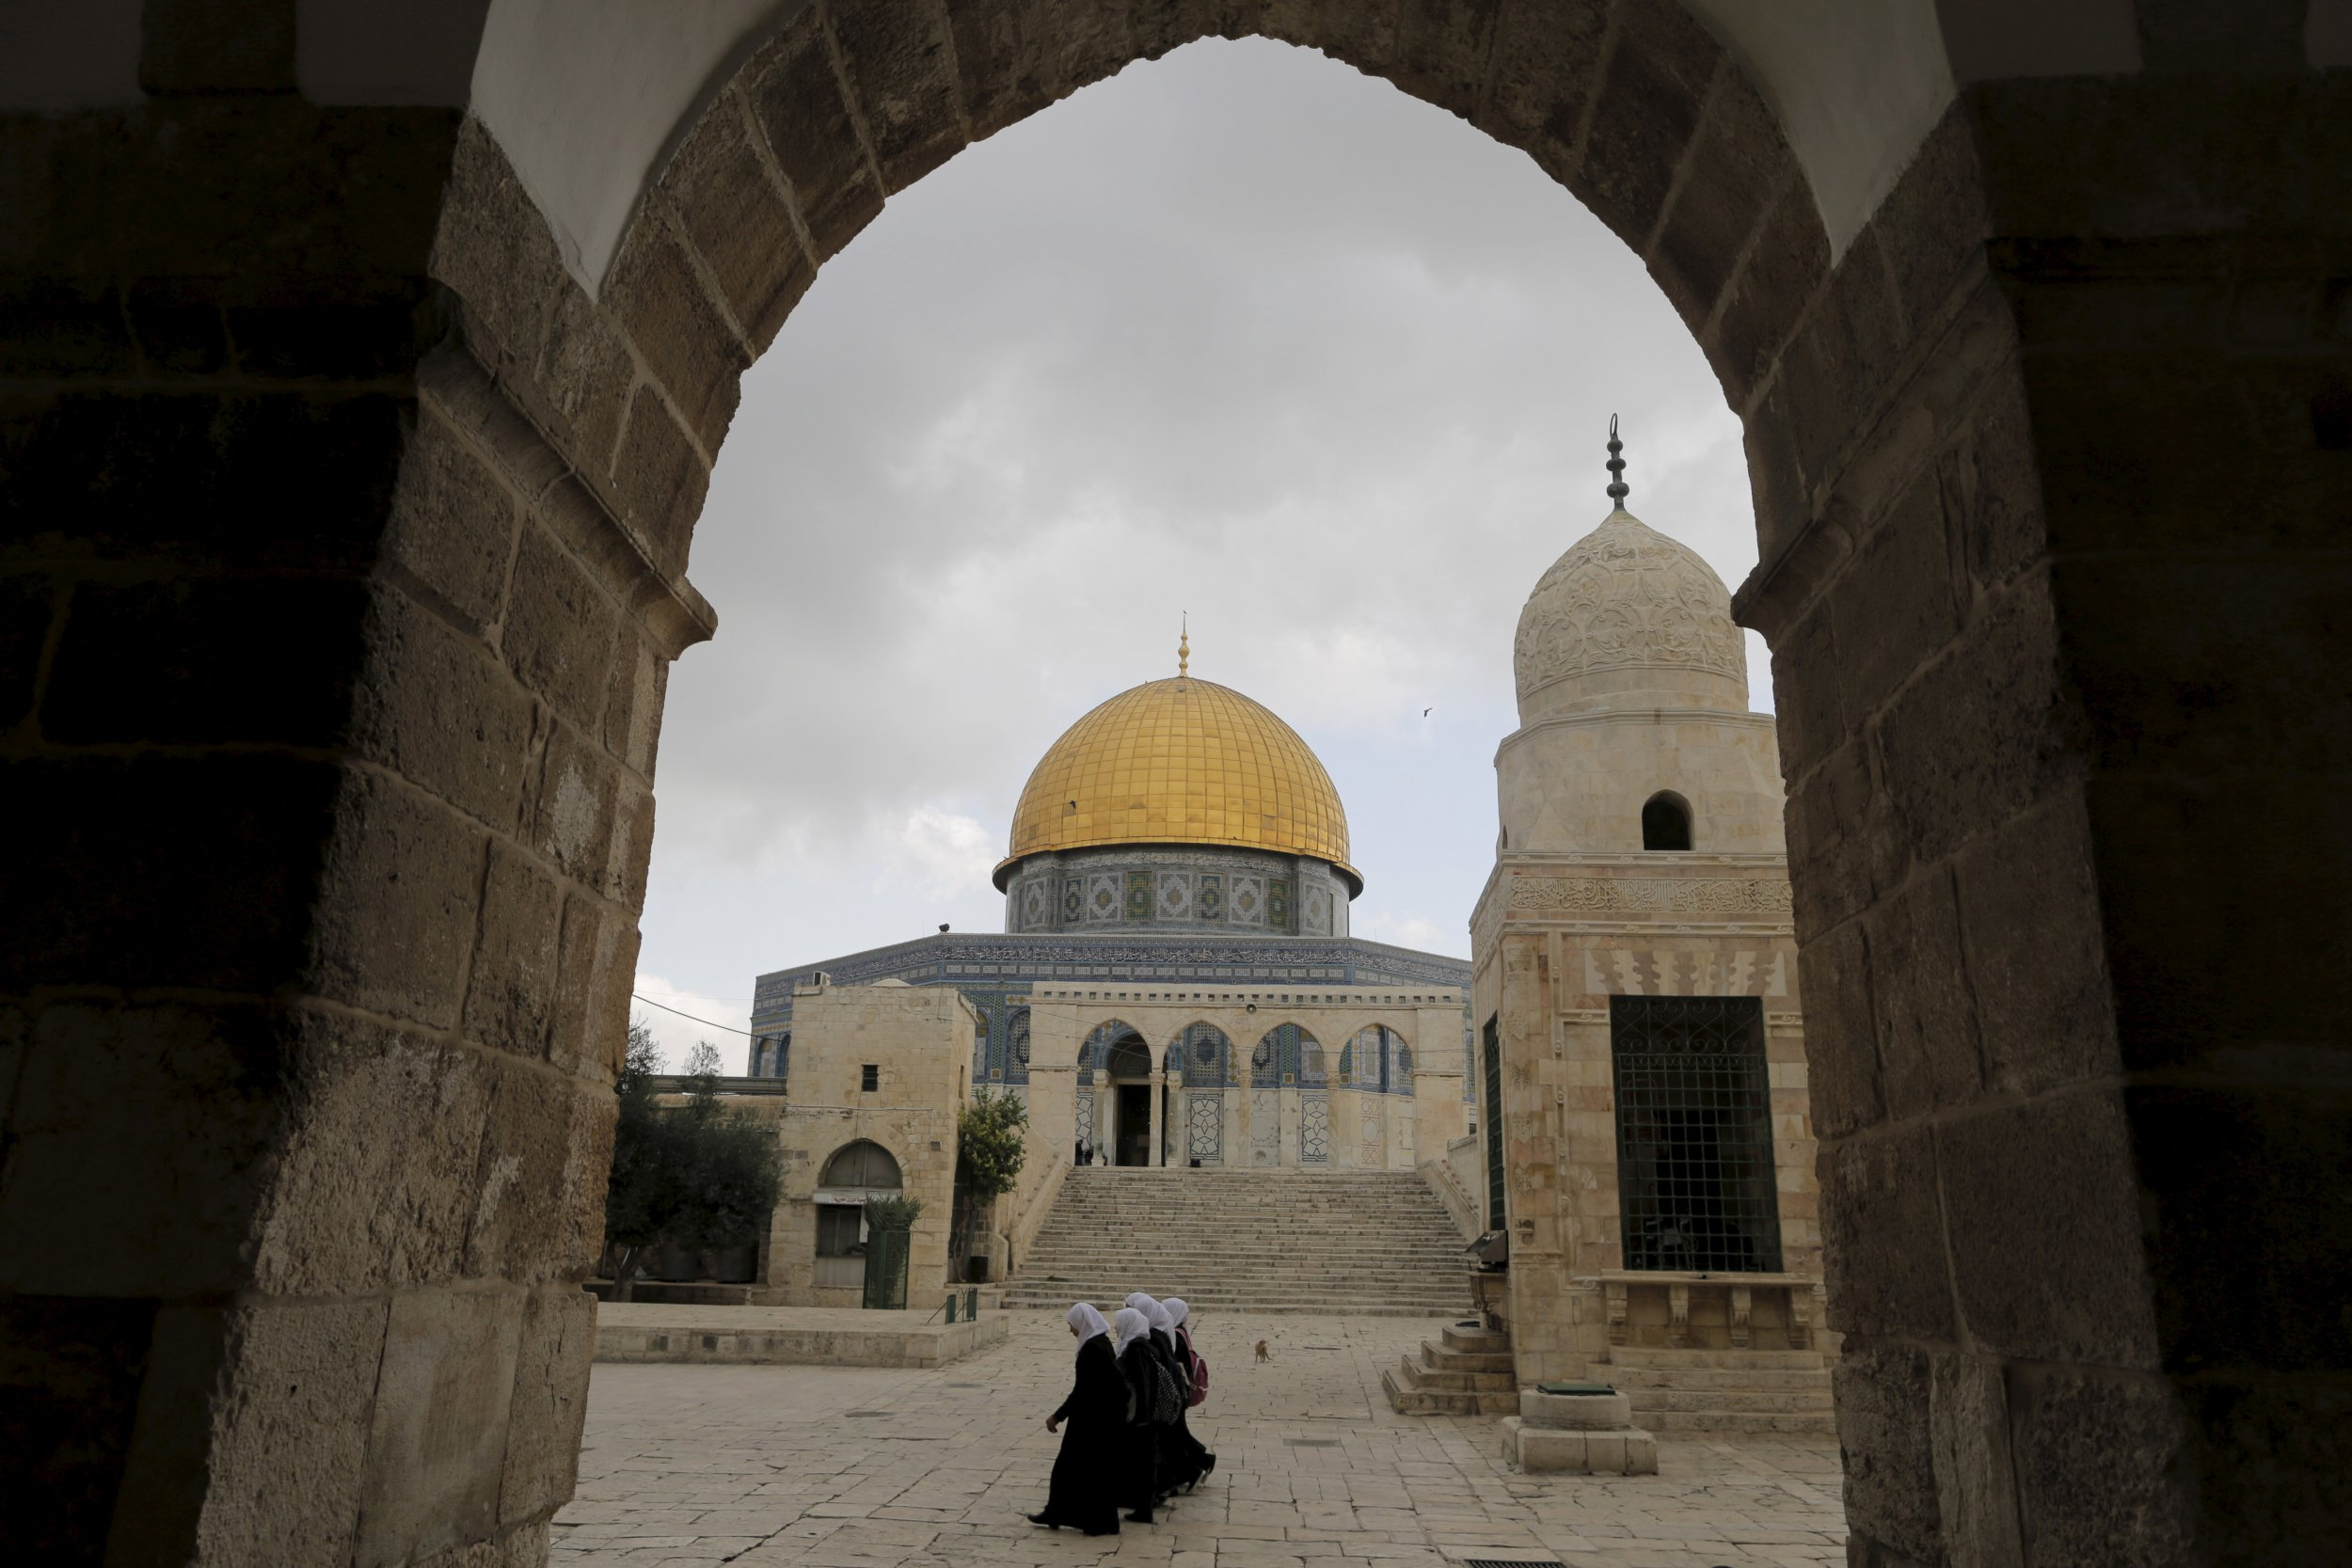 Michael Rubin: UNESCO's so anti-Semitic, it should be wound up